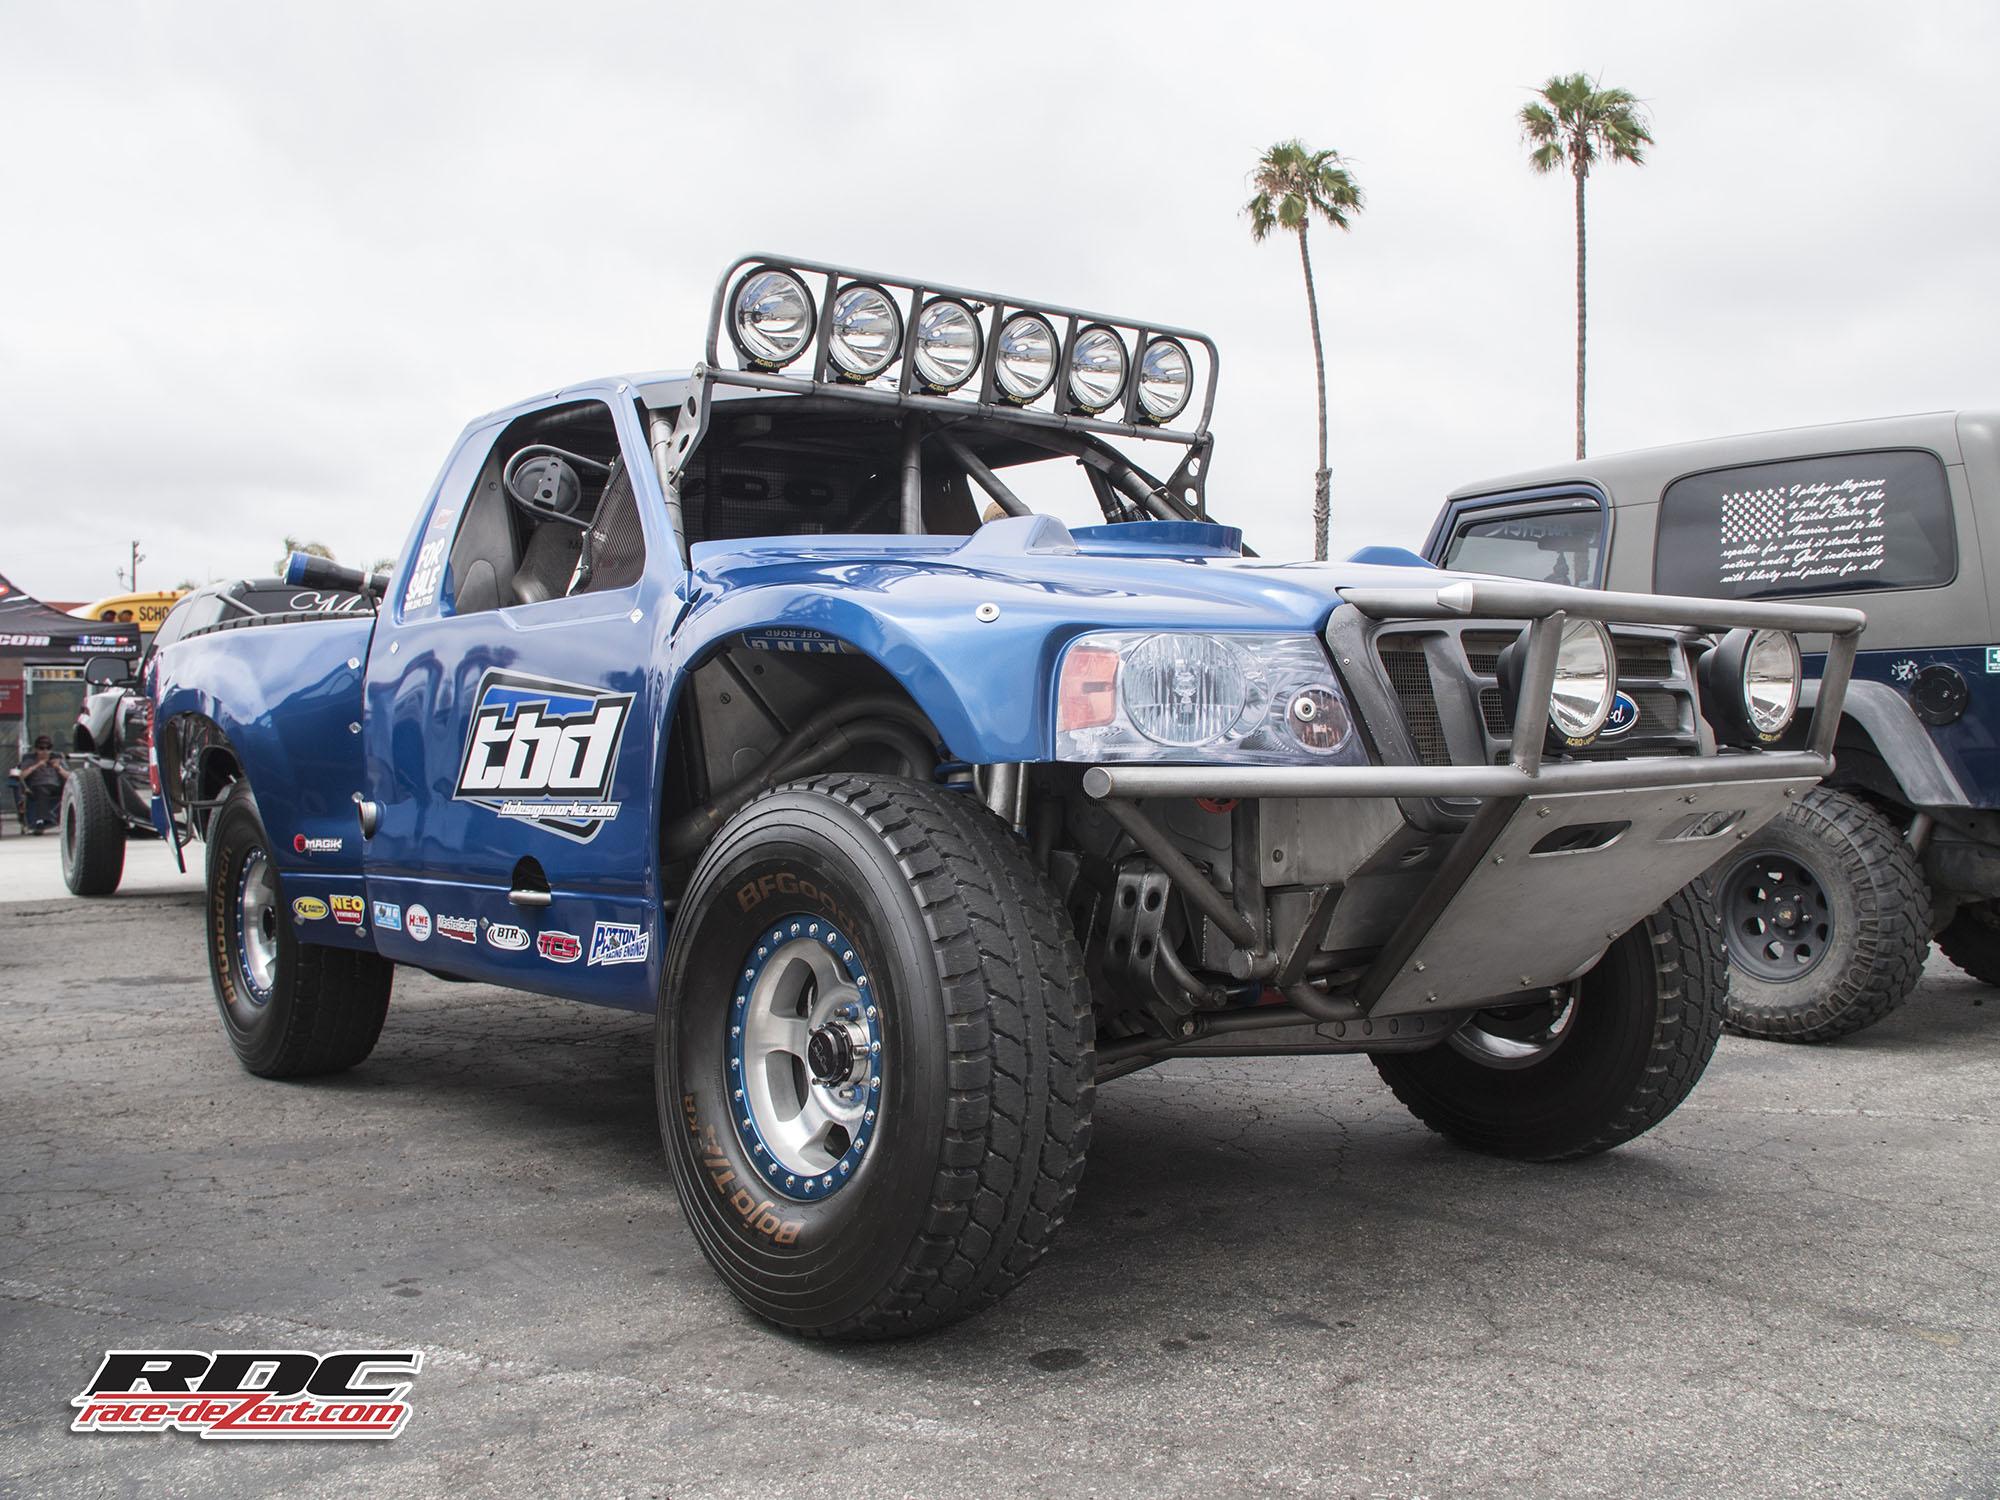 2018-fuel-the-desert-race-dezert_01.jpg